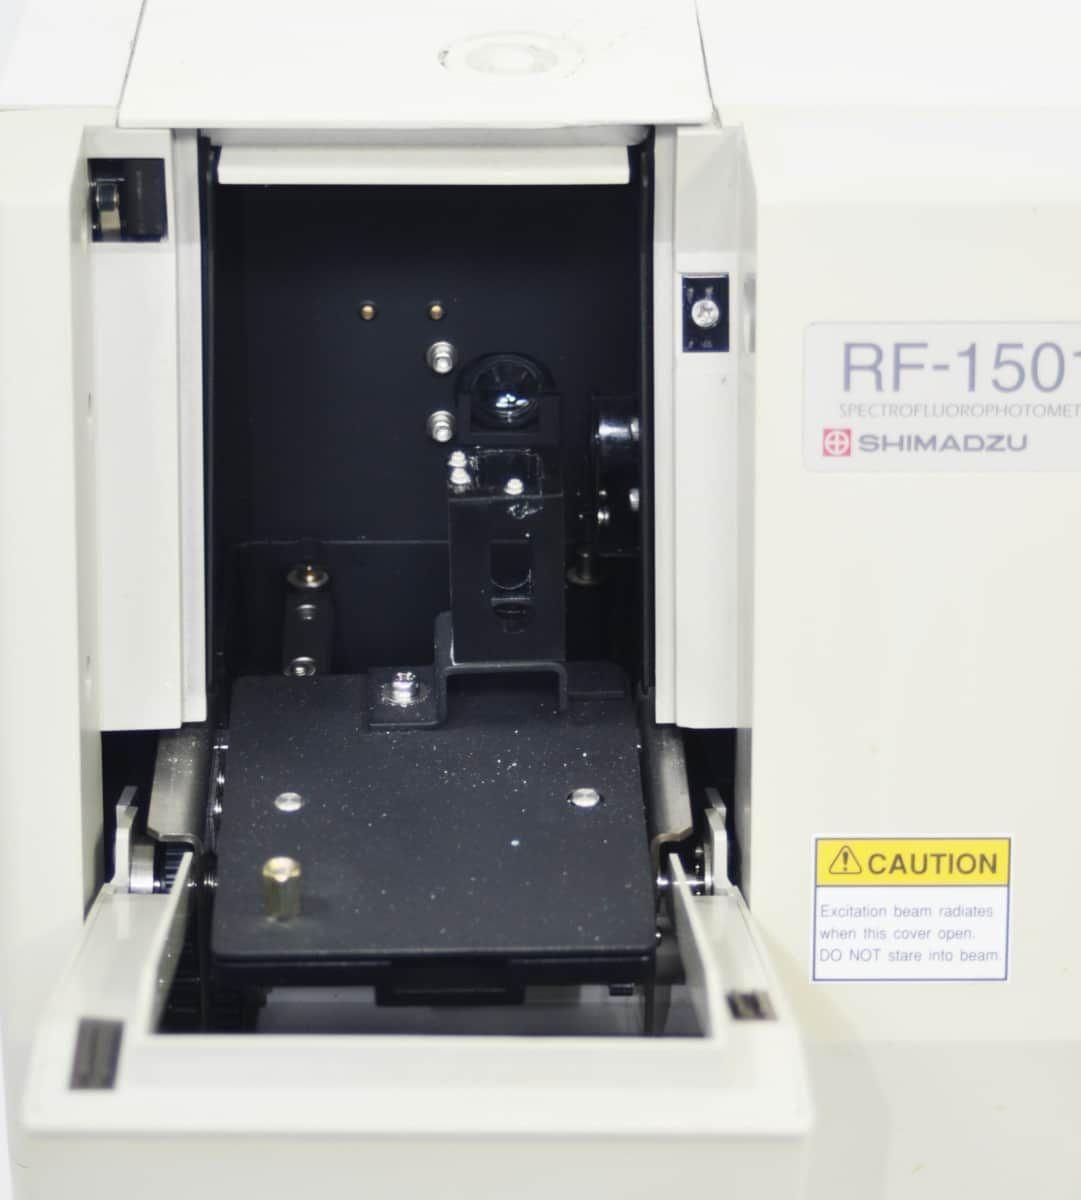 SHIMADZU RF-1501 Spectrofluorophotometer